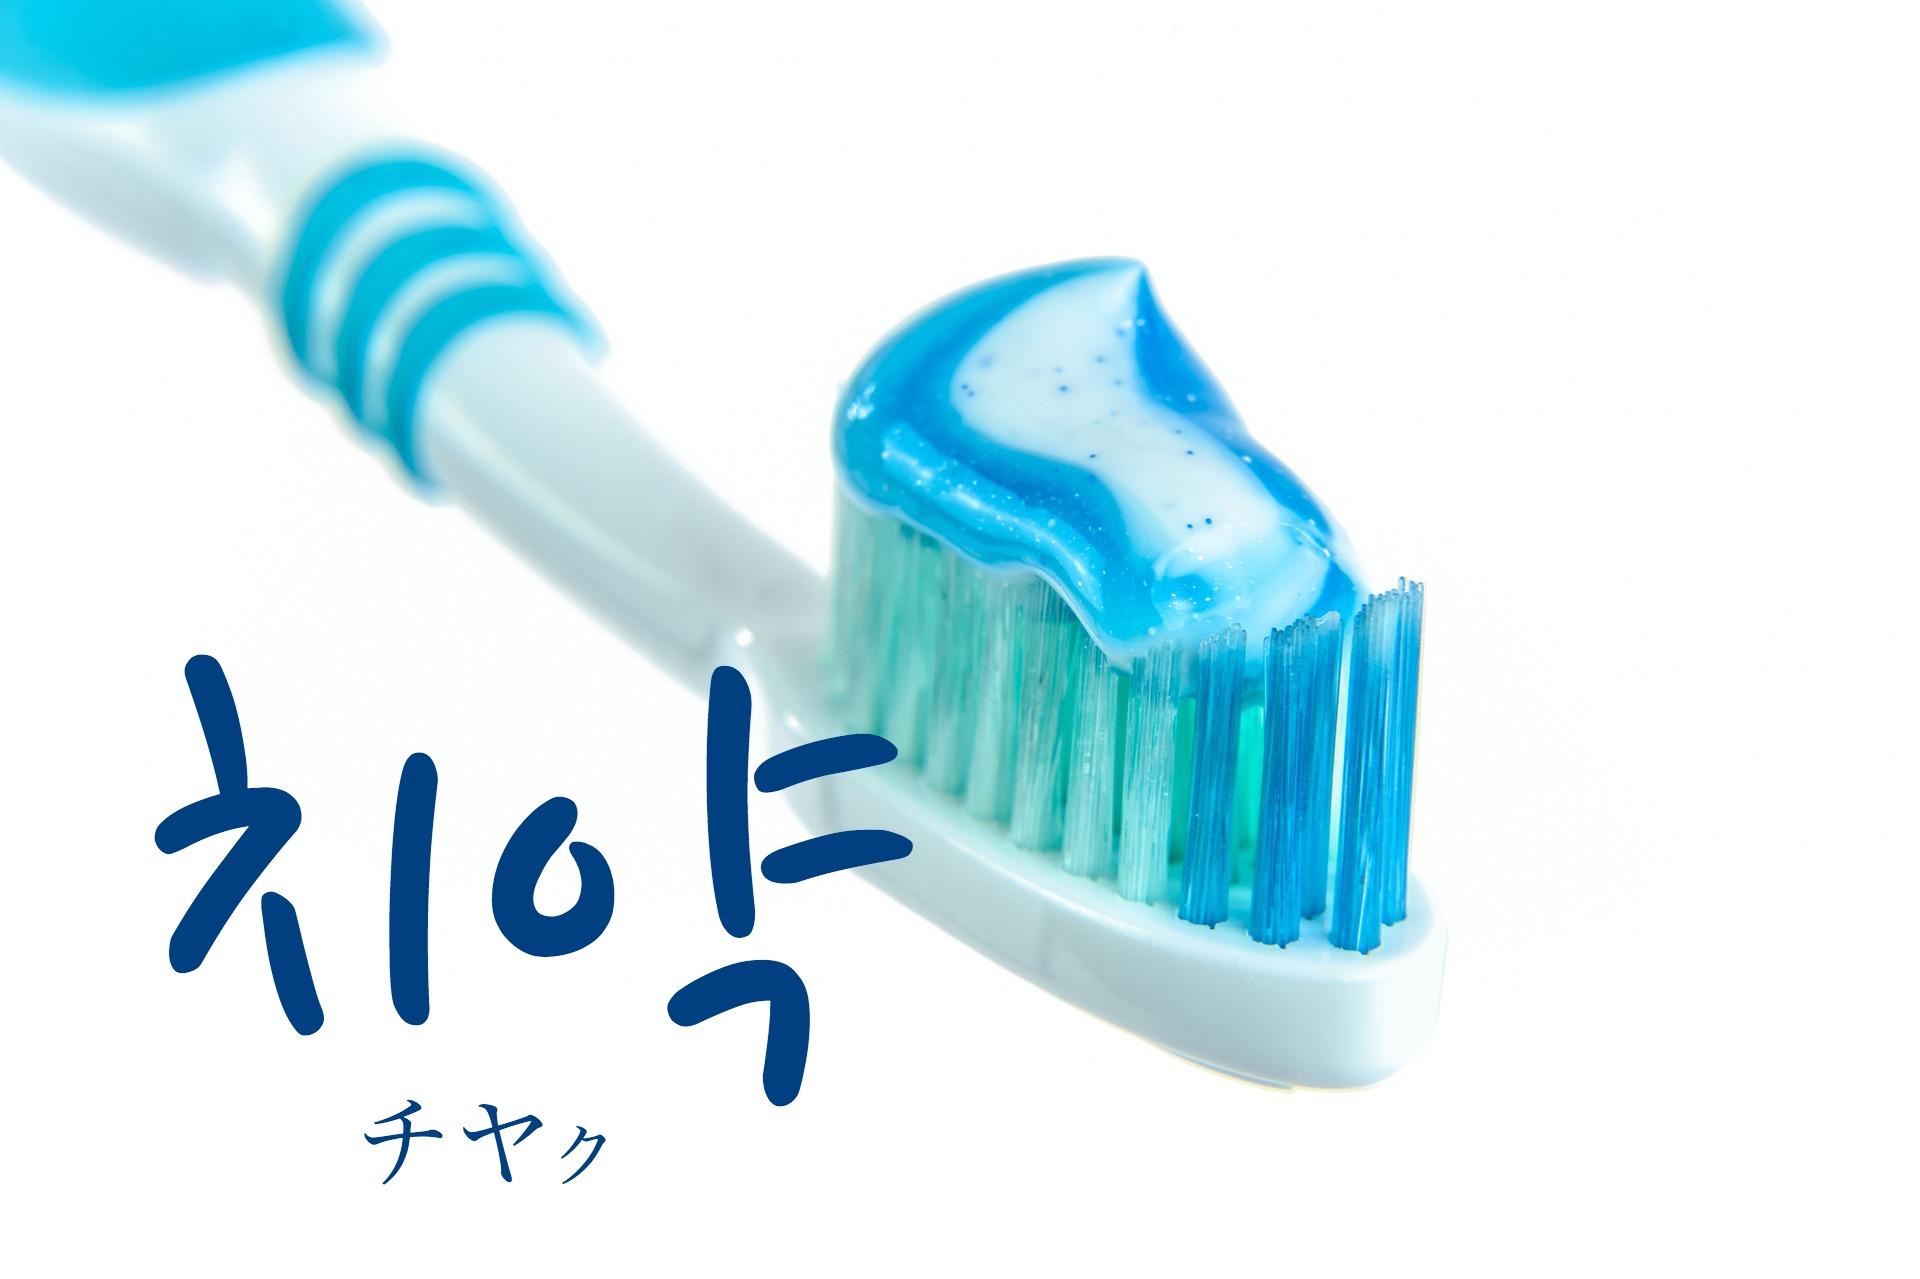 koreanword-toothpaste